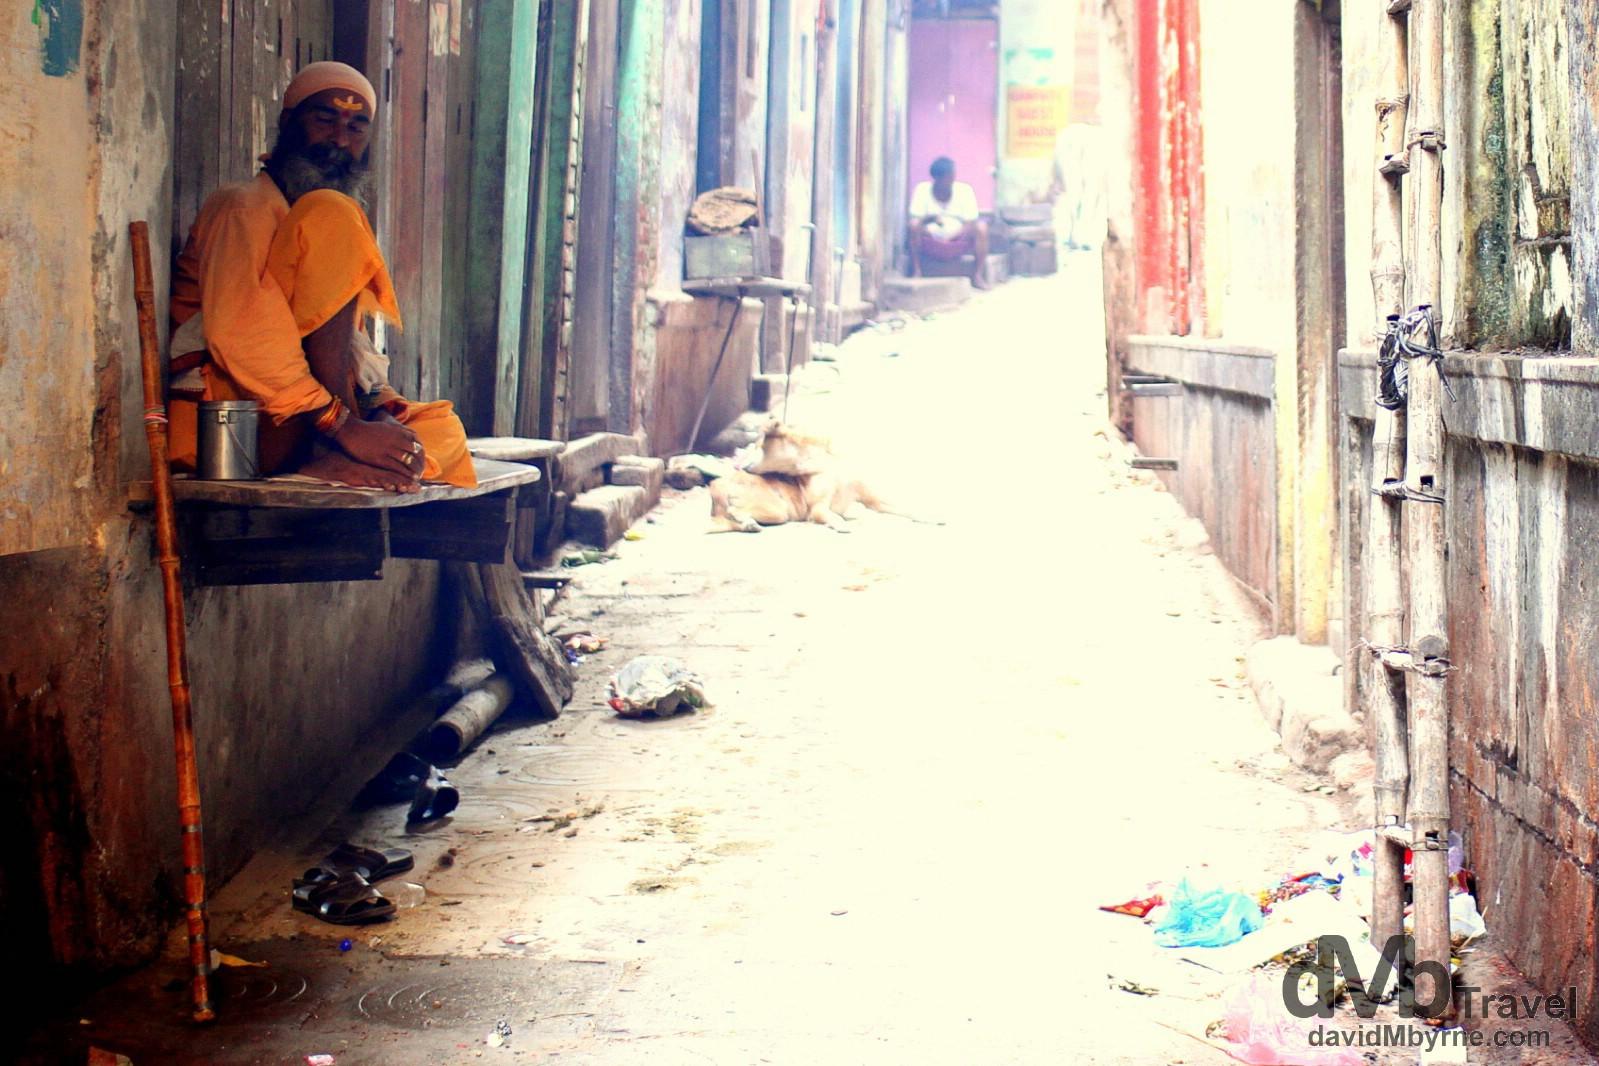 A sadhu sitting in a lane in the Old City of Varanasi, Uttar Pradesh, India. October 14th 2012.